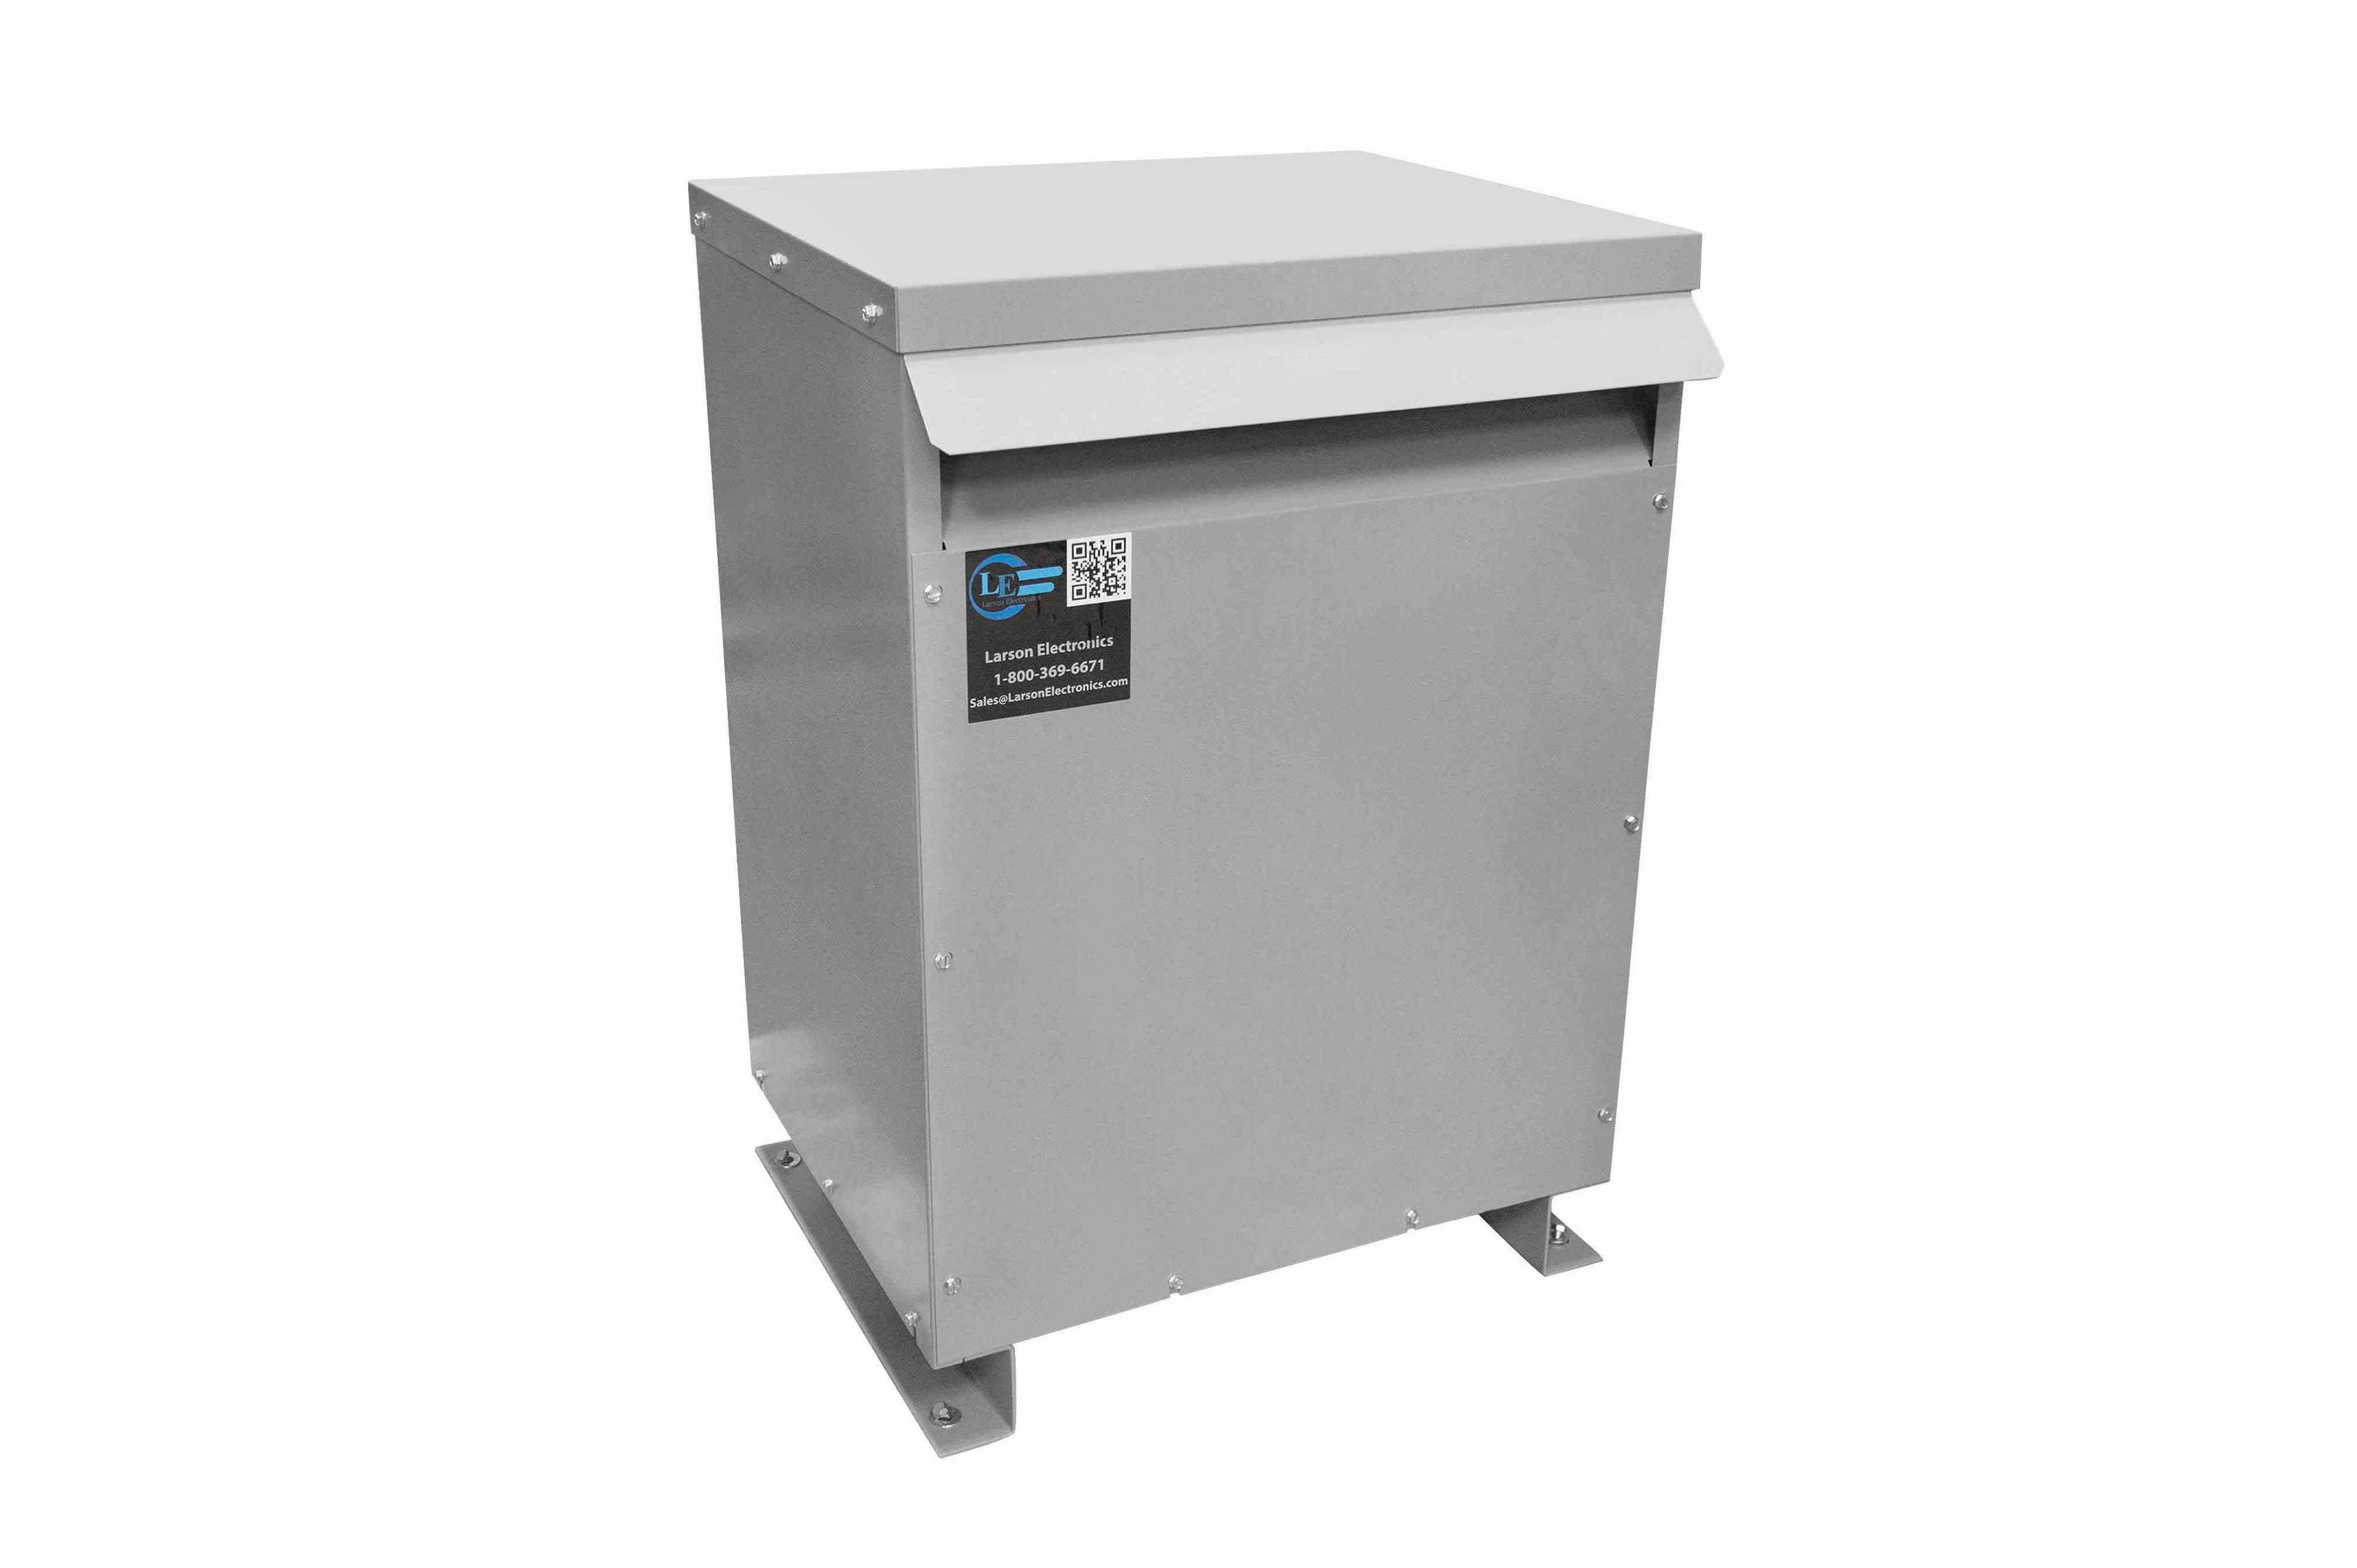 100 kVA 3PH Isolation Transformer, 240V Wye Primary, 600Y/347 Wye-N Secondary, N3R, Ventilated, 60 Hz